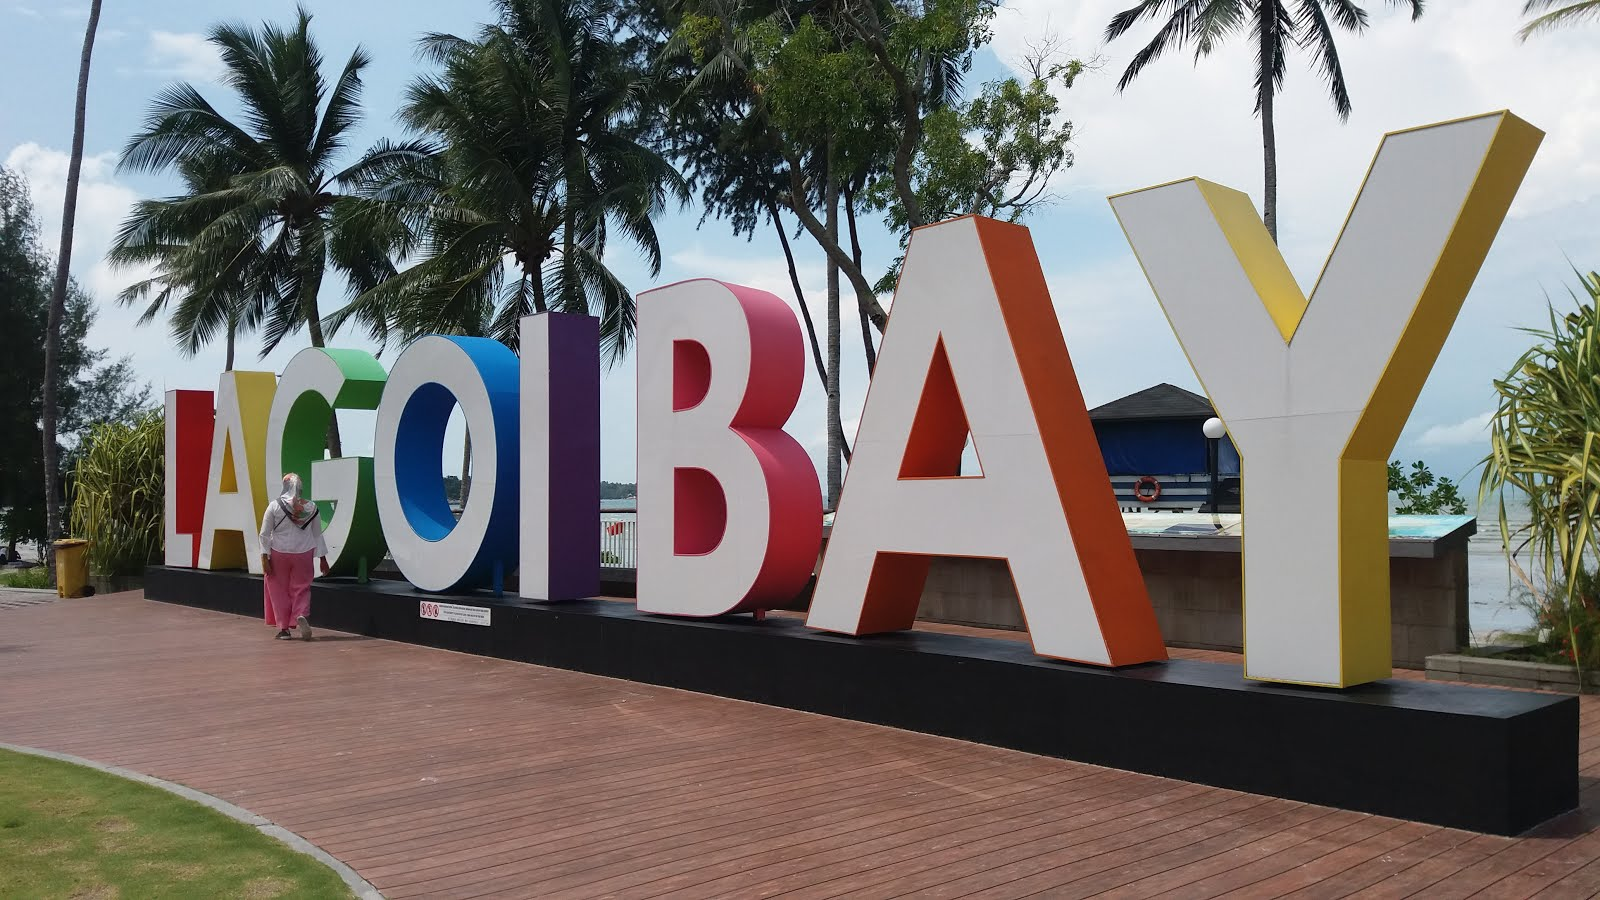 Wandering Jfo Objek Wisata Pulau Bintan Tak Dilewatkan Sebuah Termasuk